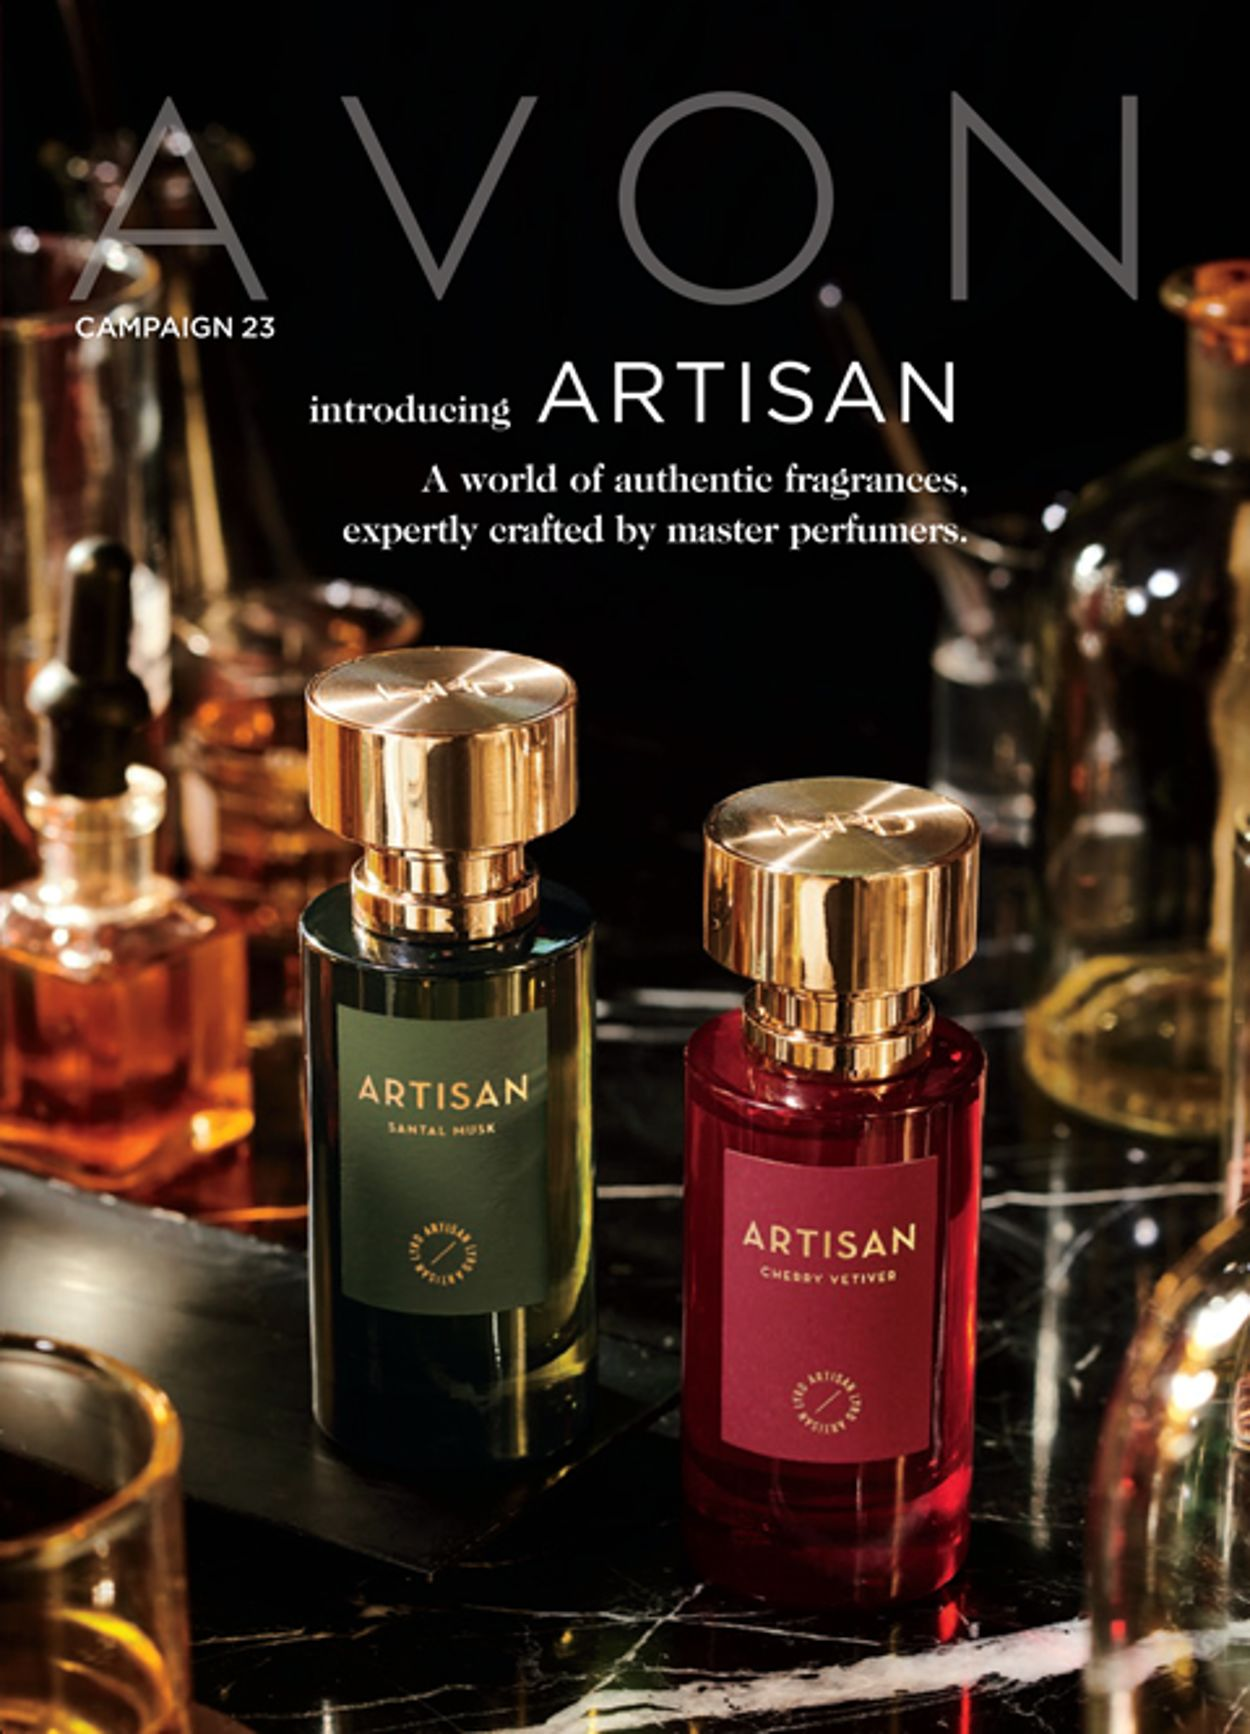 Catalogue Avon from 10/13/2020